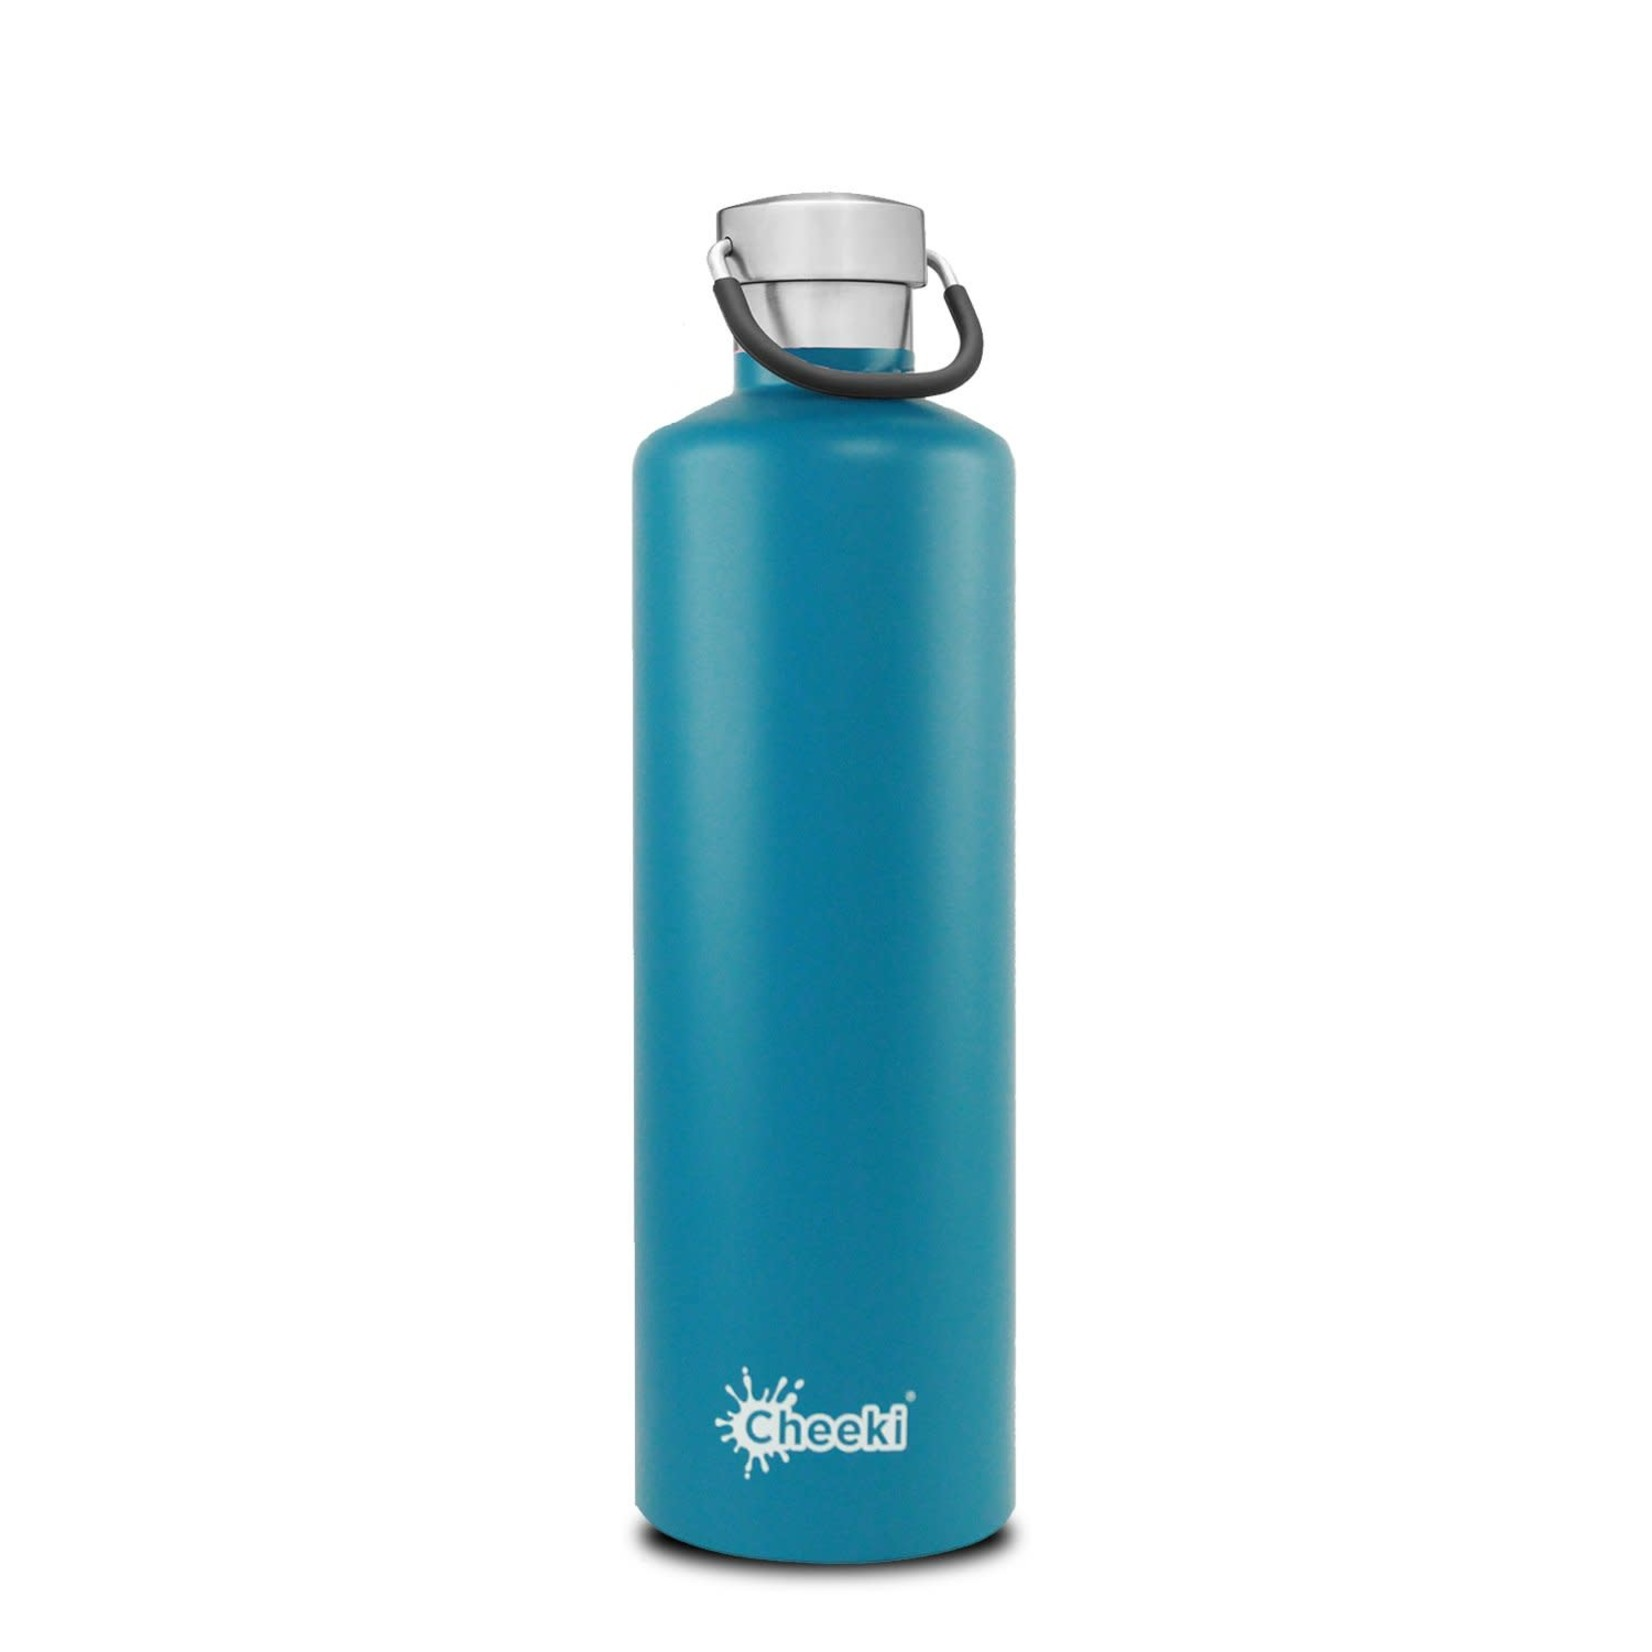 Cheeki Cheeki Insulated Bottle 1 Litre